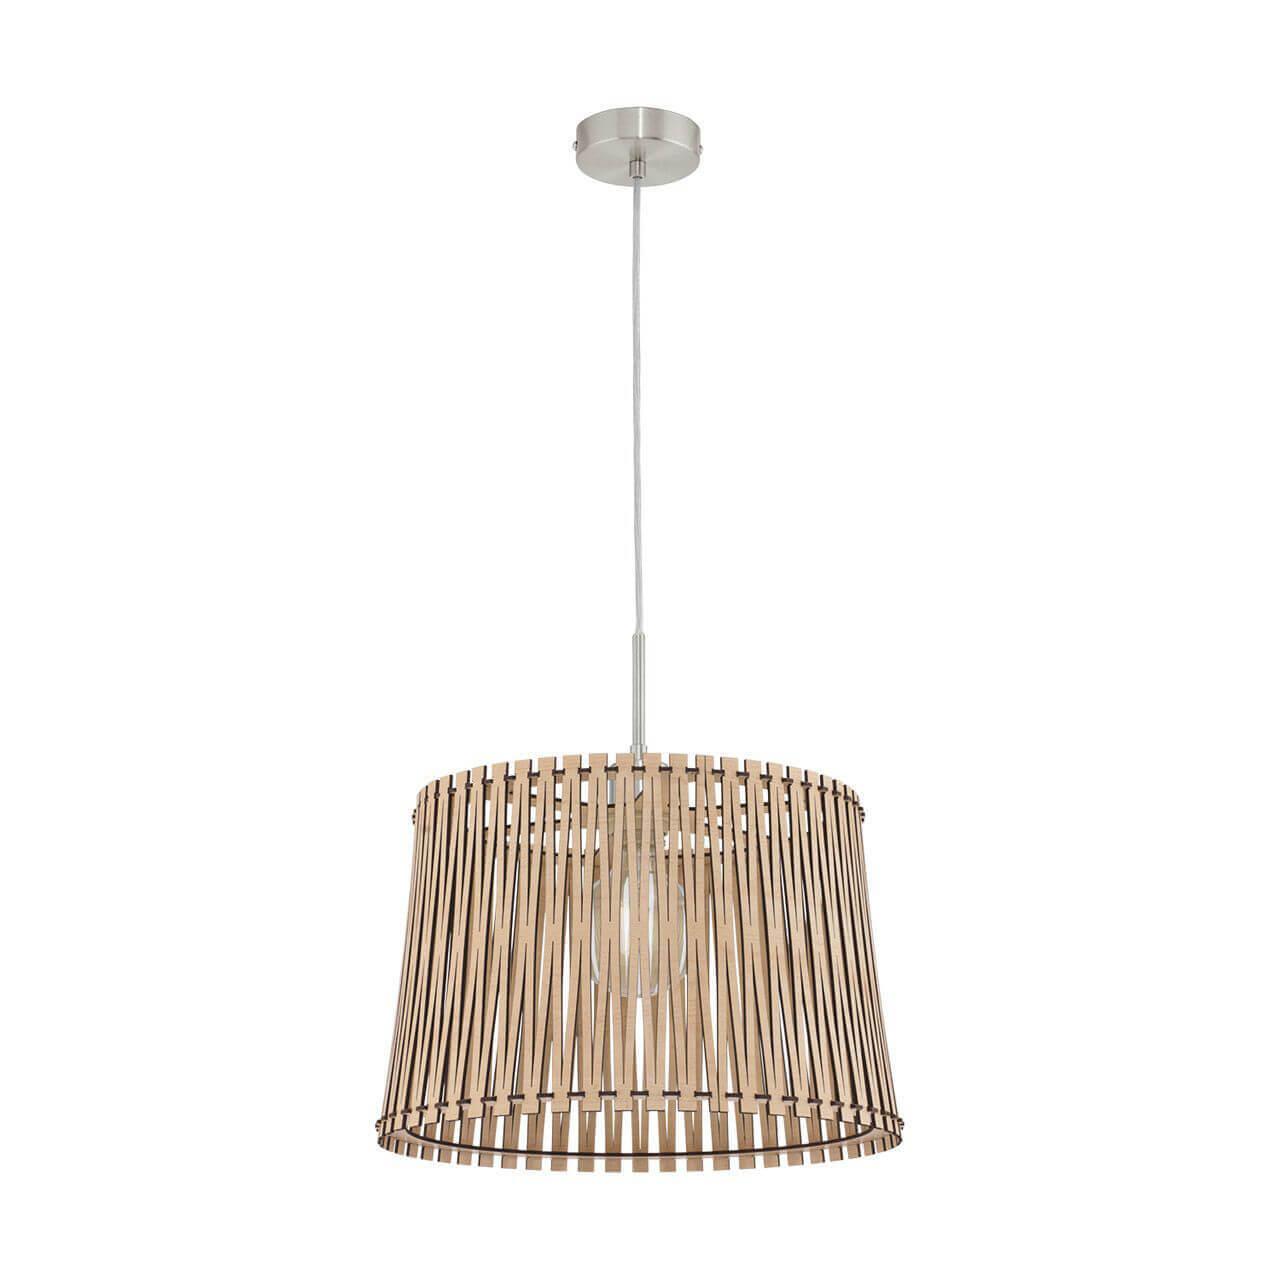 Подвесной светильник Eglo Sendero 96192 цены онлайн